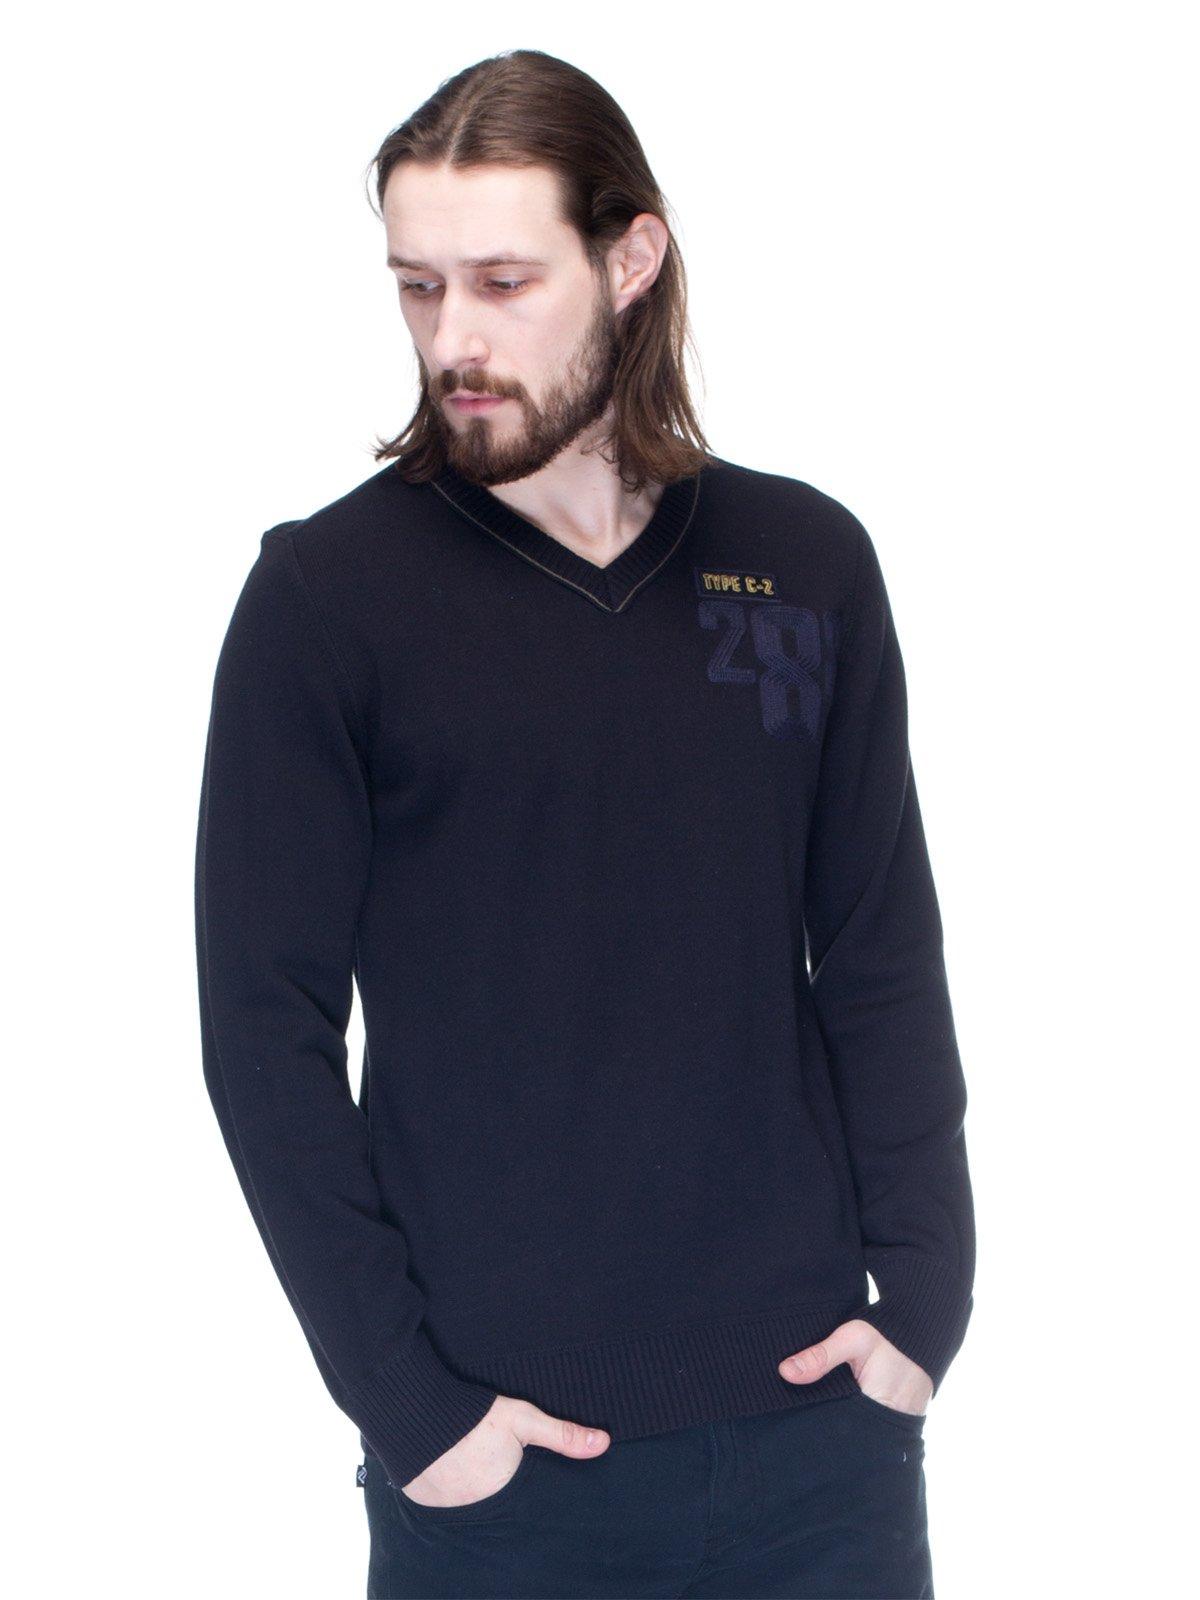 Пуловер чорний з малюнком | 1353574